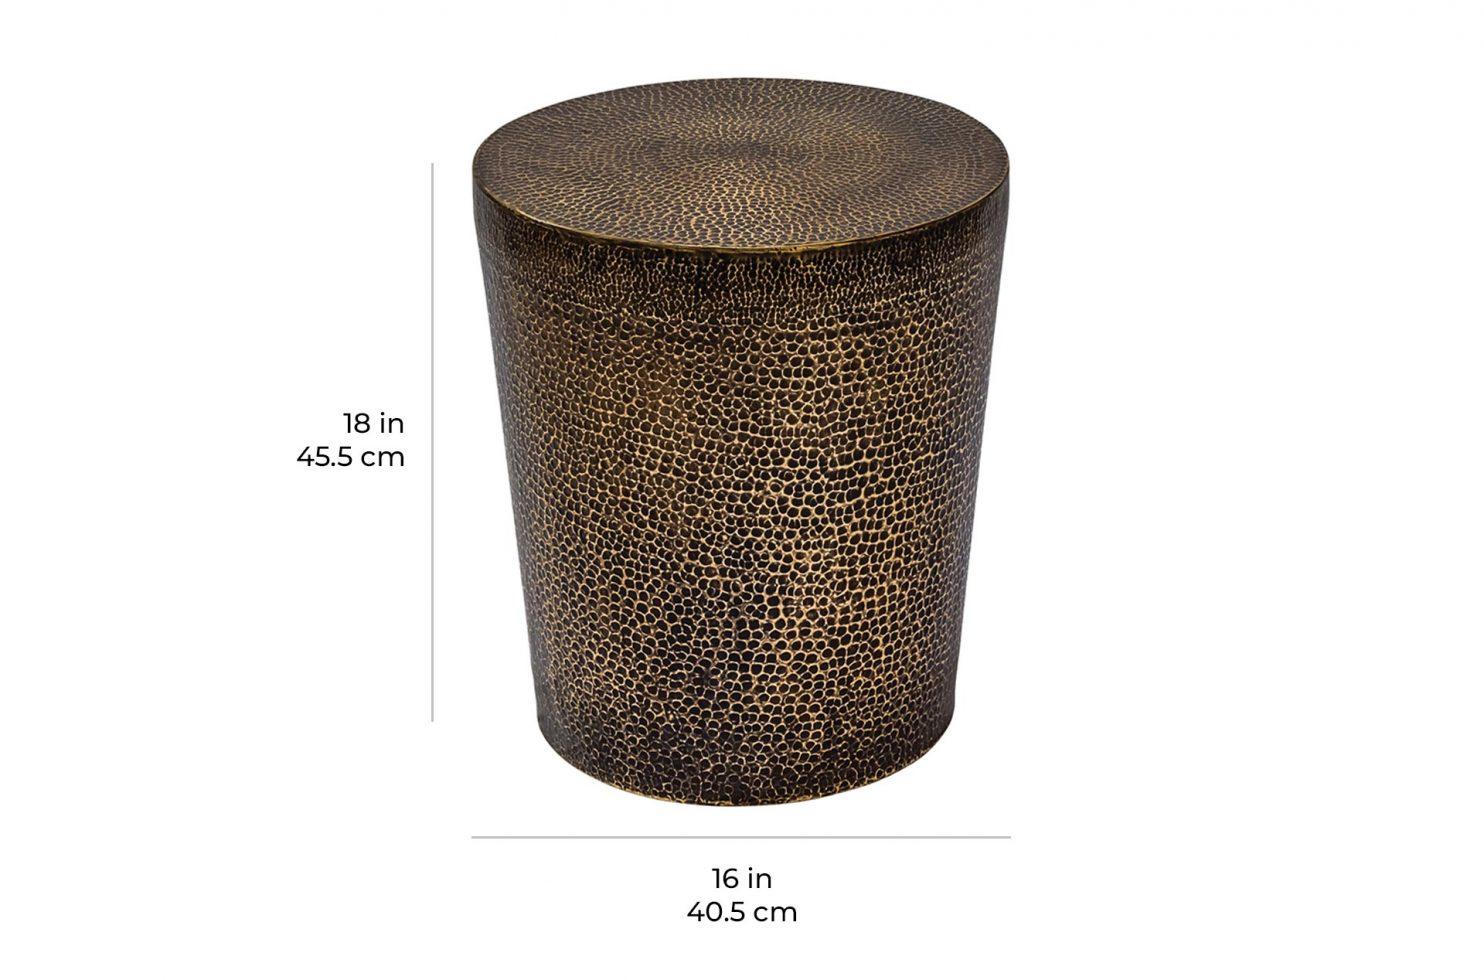 ingot ore table 520FT002P2 scale dims